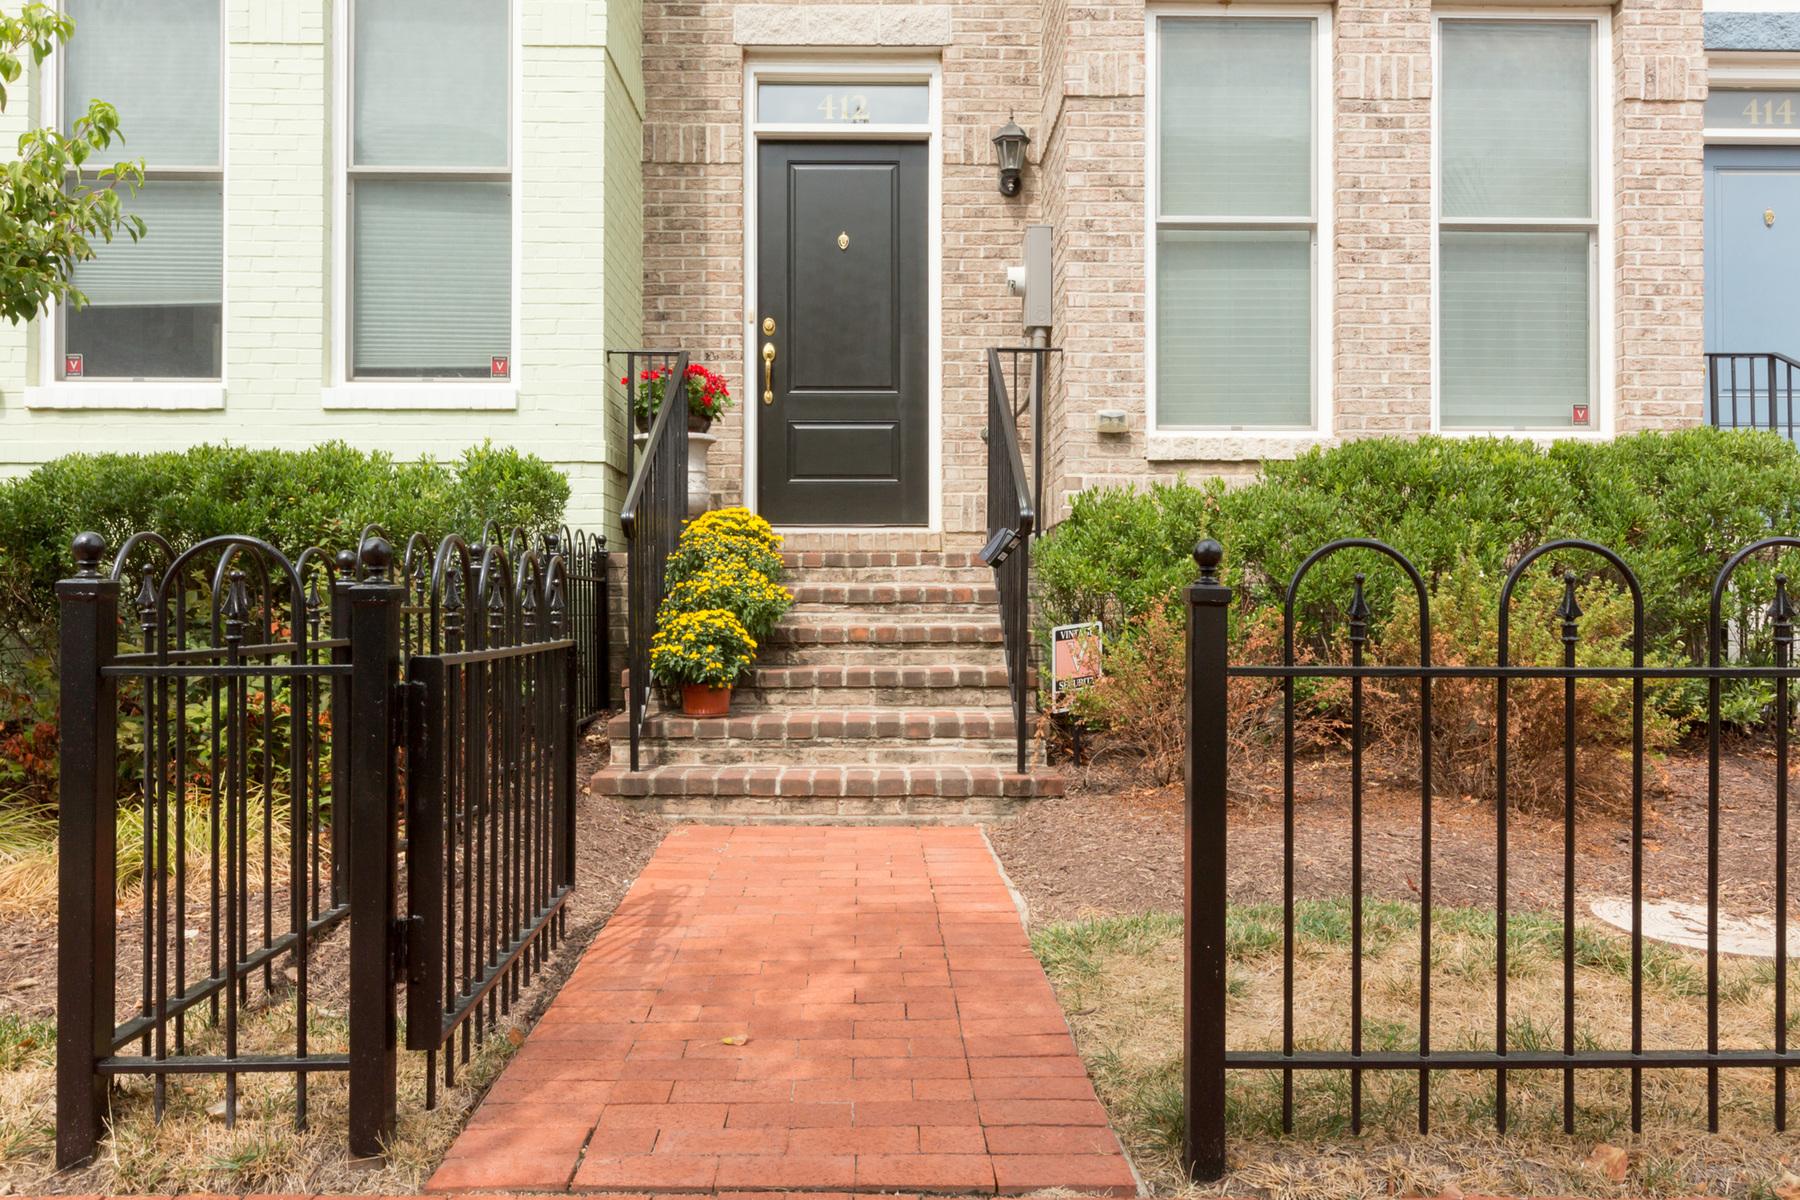 Property For Sale at 412 L Street Se, Washington